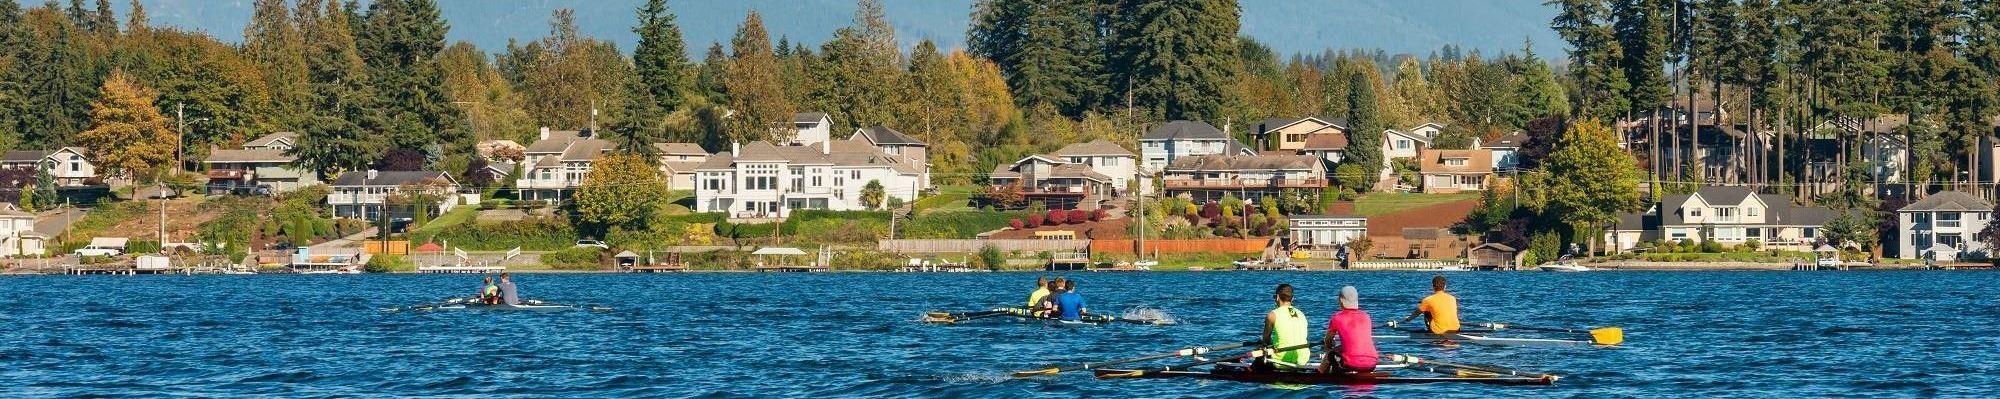 Lake Stevens, WA - Official Website | Official Website